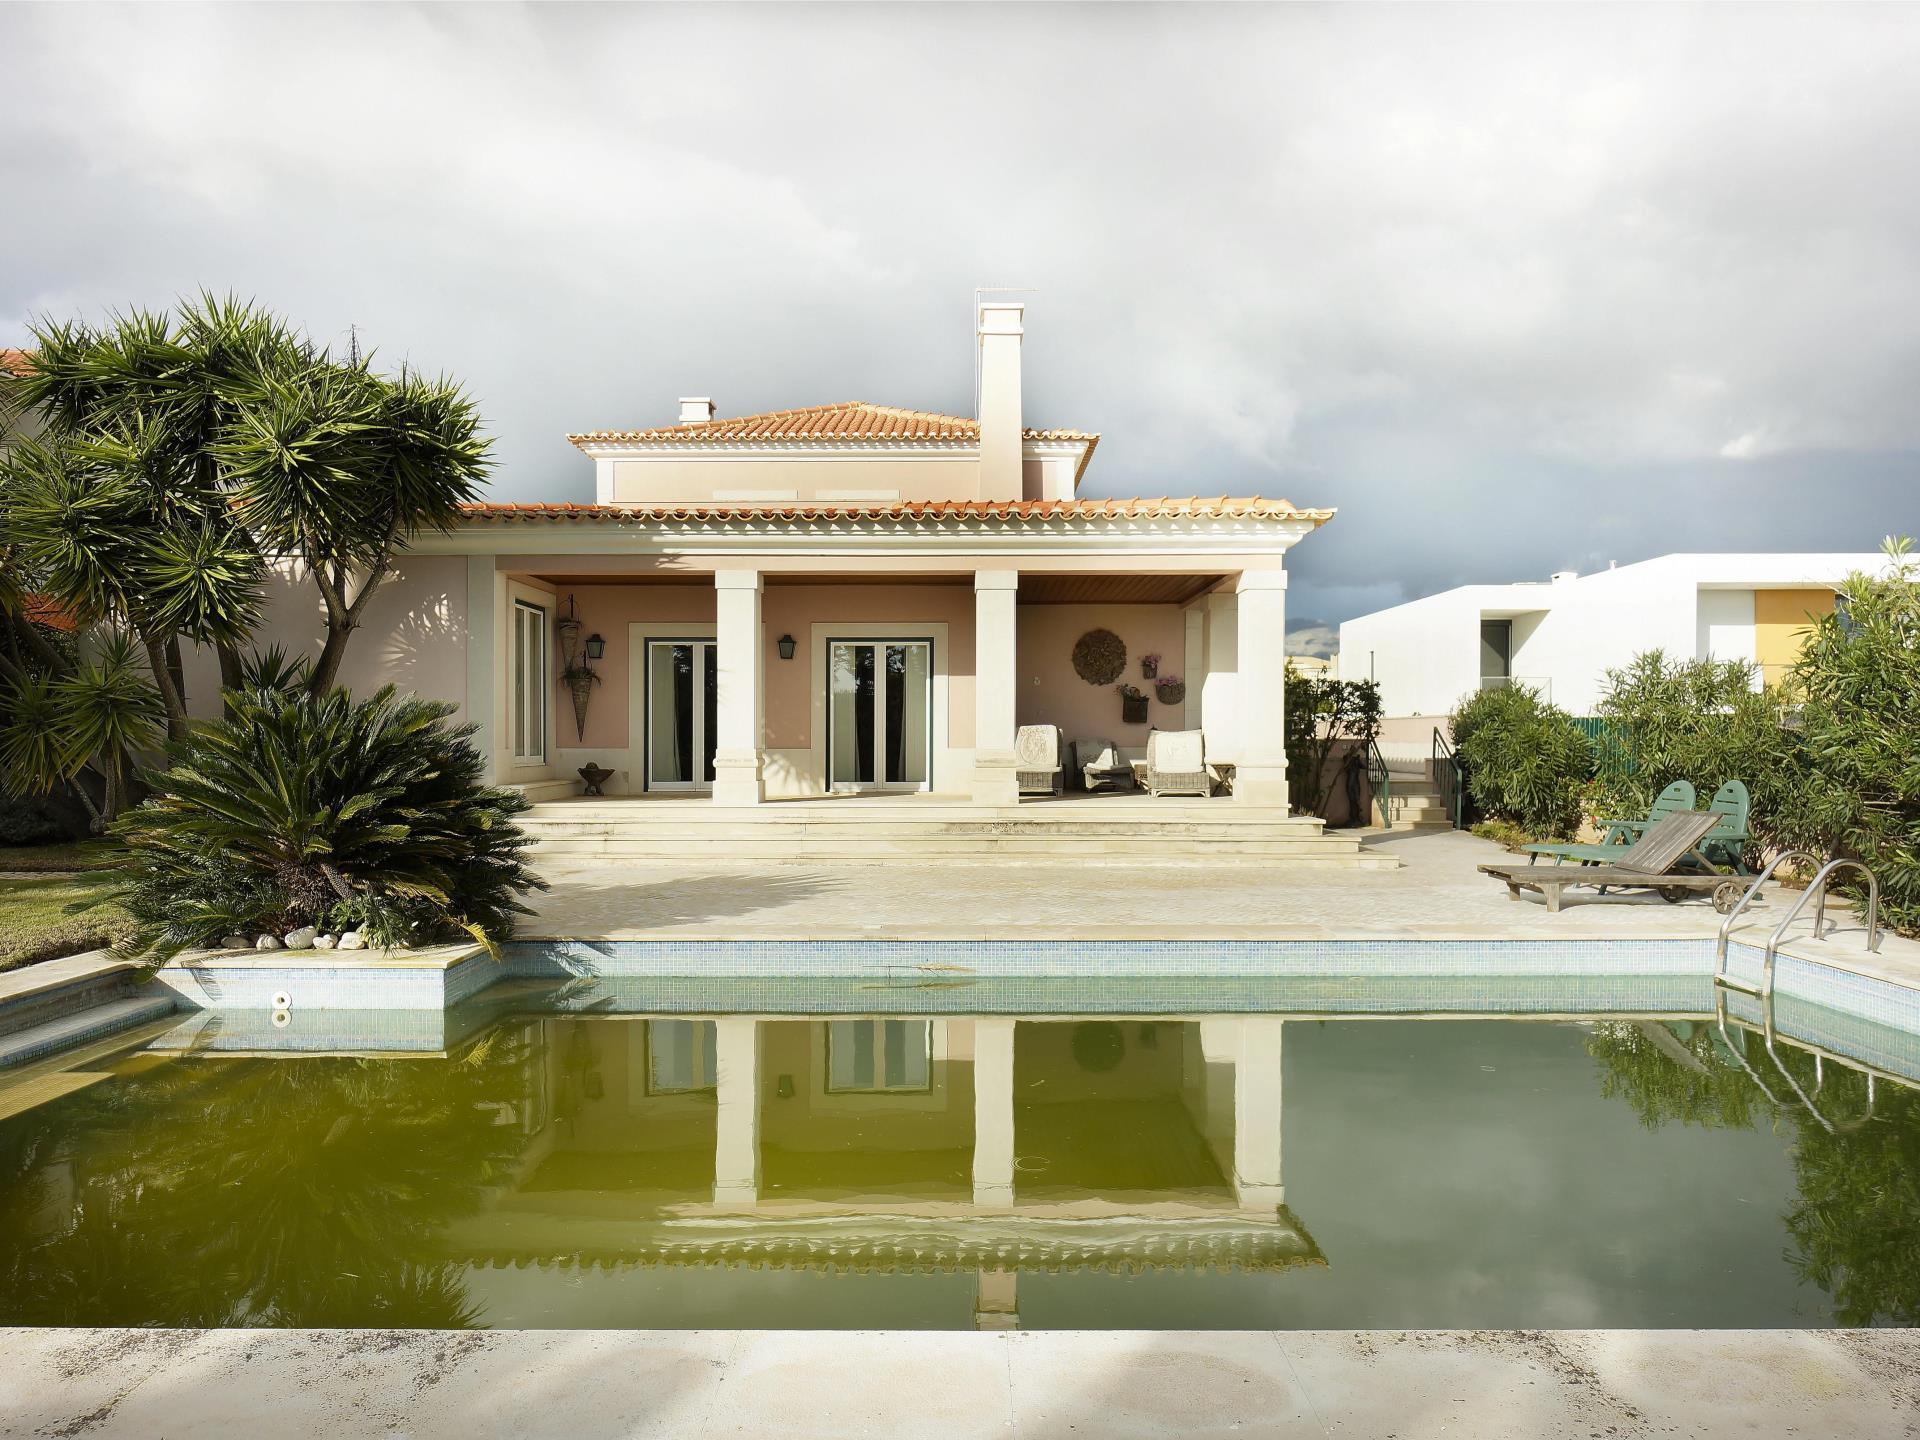 独户住宅 为 销售 在 House, 3 bedrooms, for Sale Quinta Da Moura, Oeiras, 葡京 葡萄牙